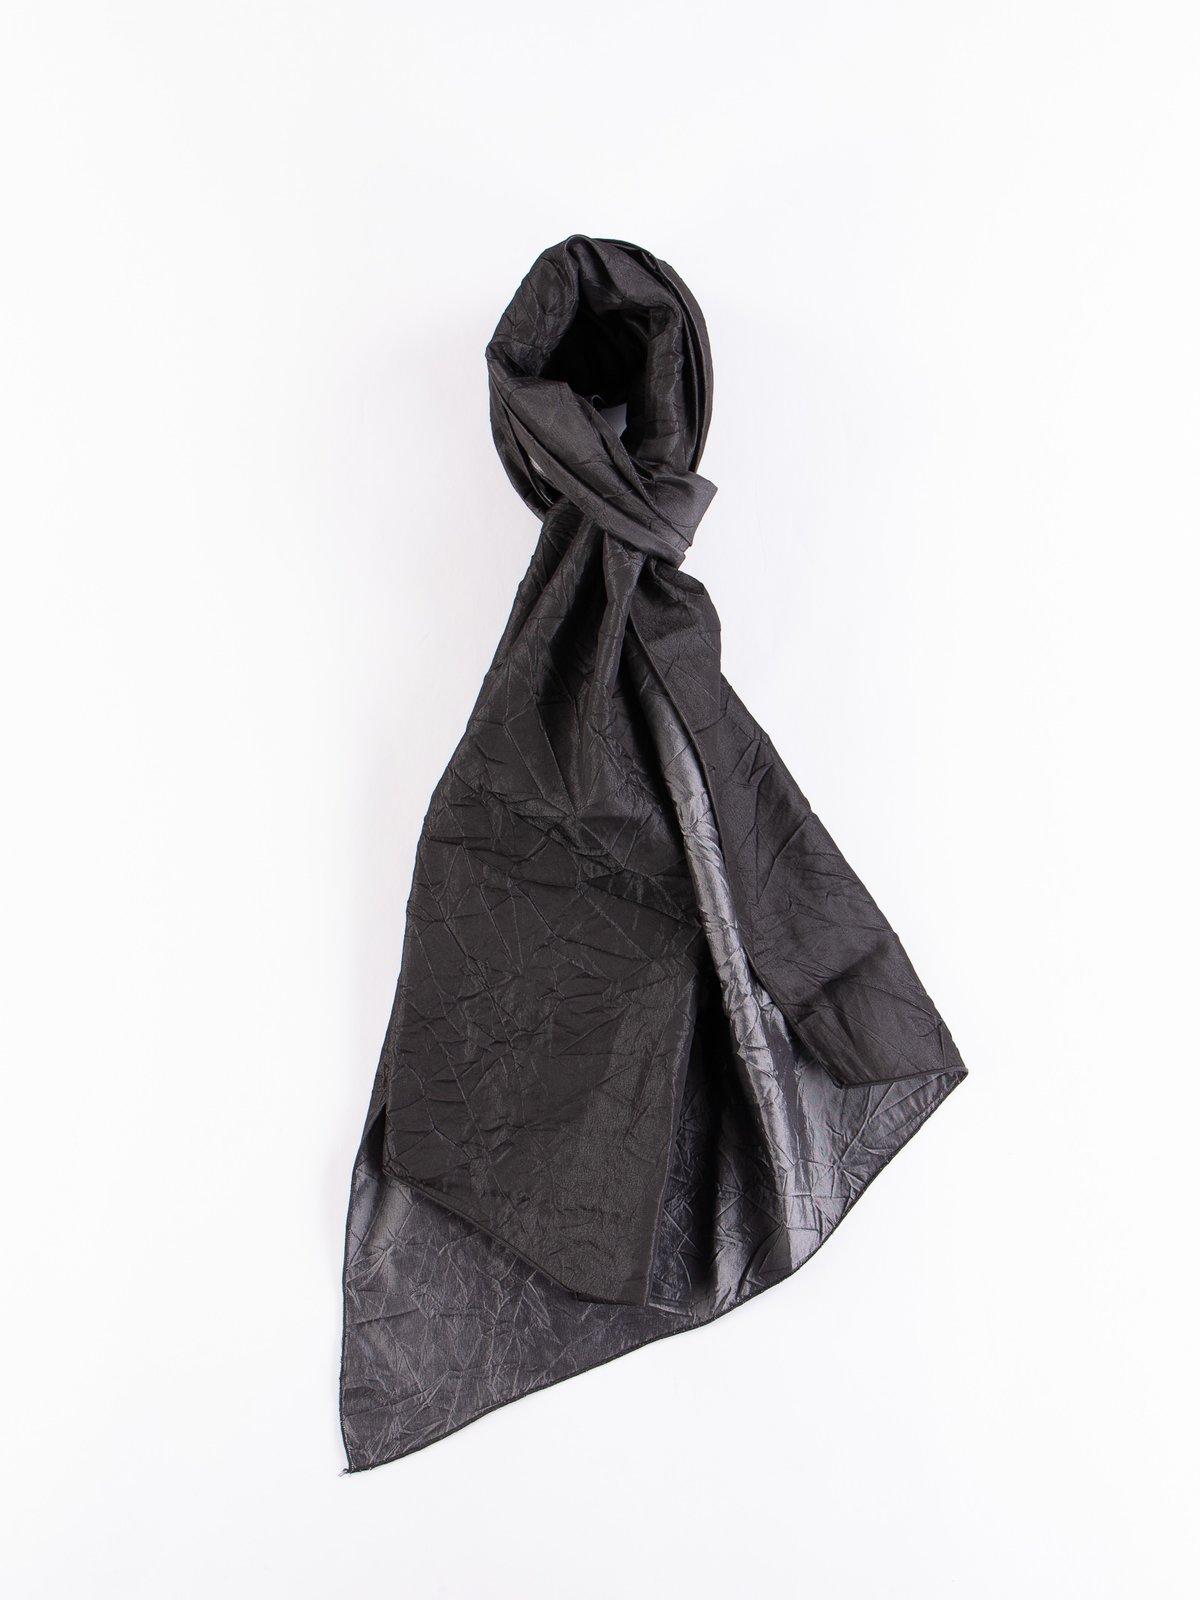 Charcoal Crushed Satin Taffeta Long Scarf - Image 1